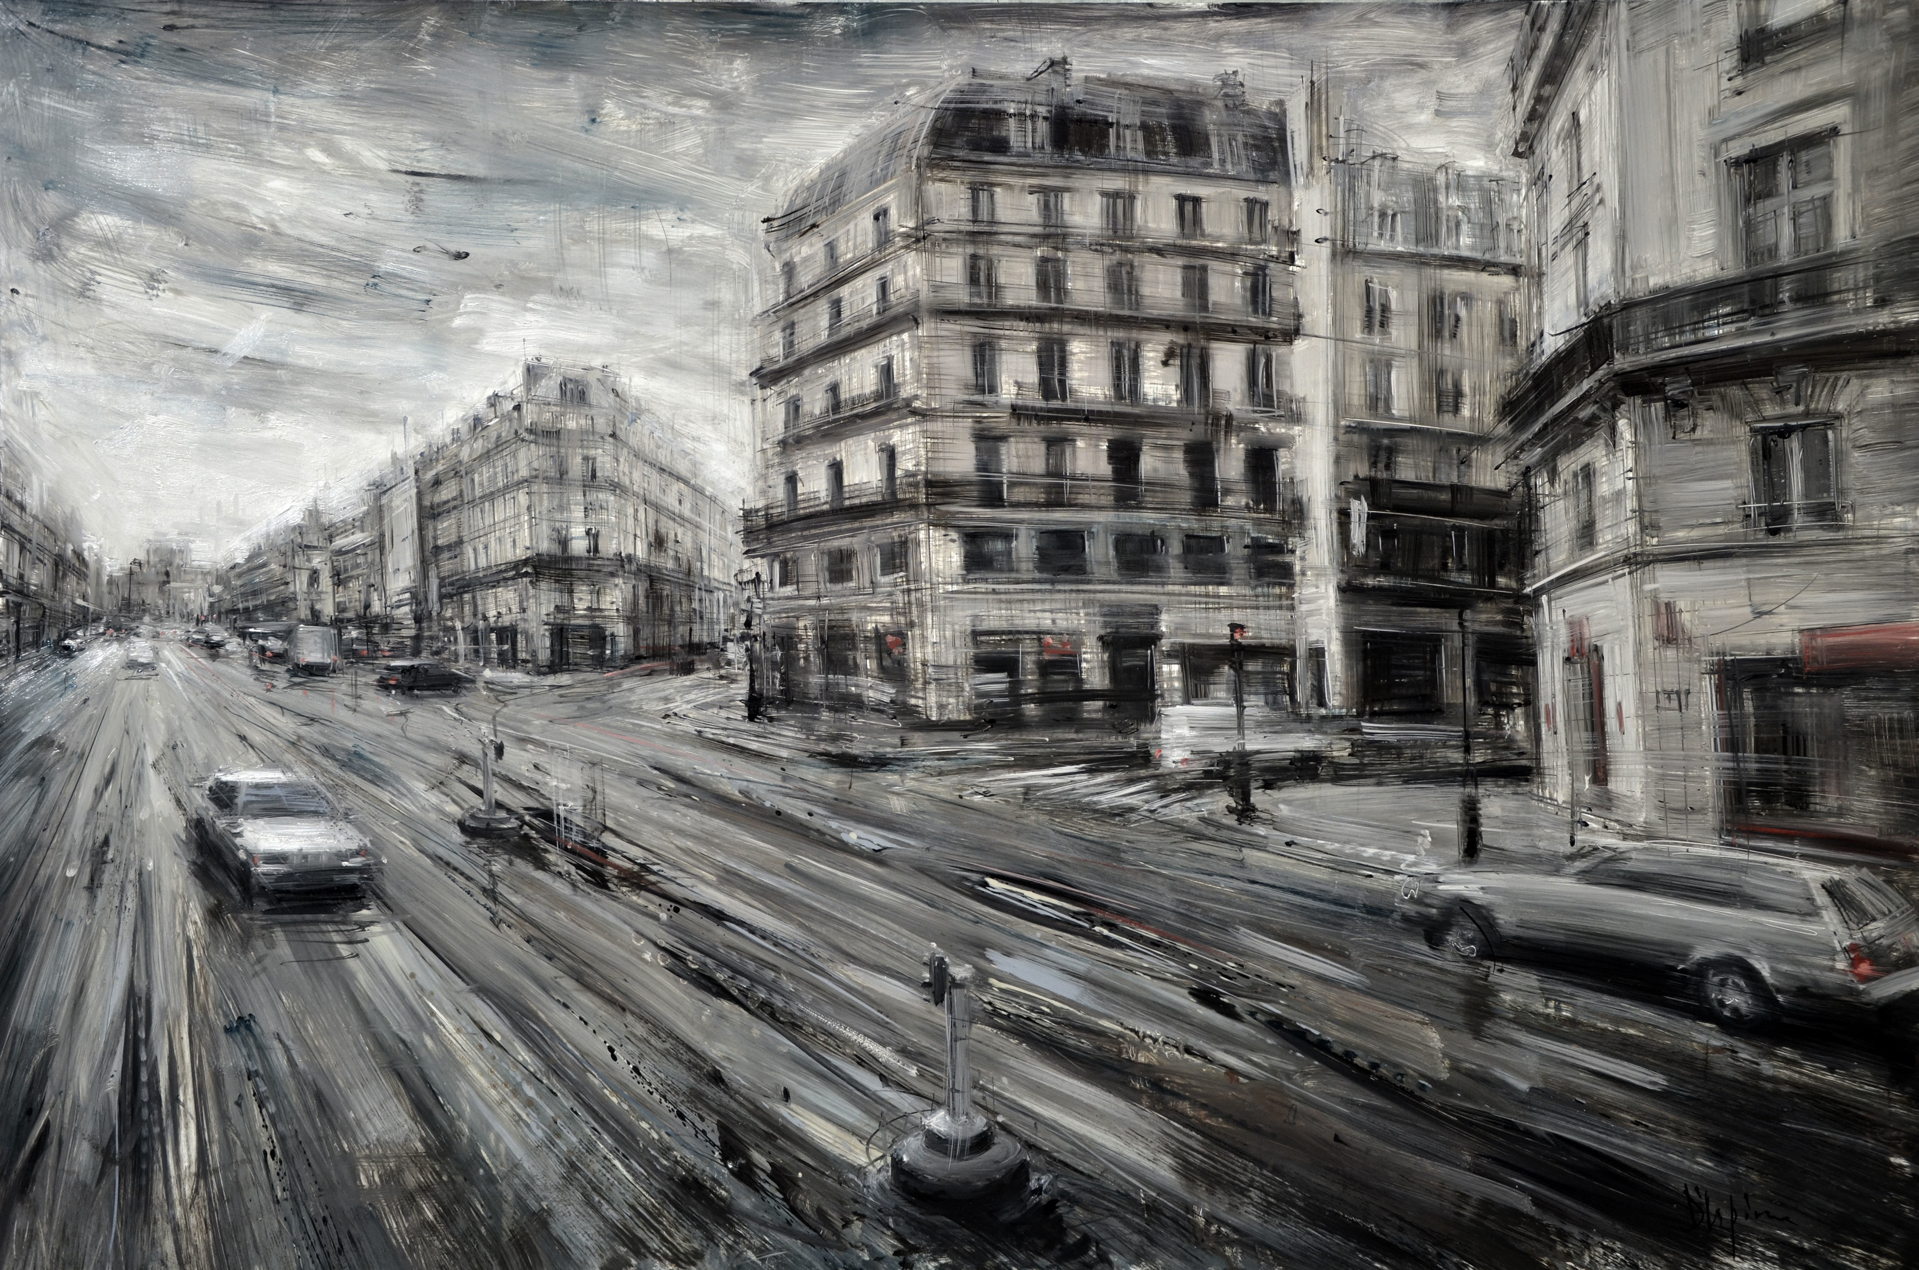 Avenue de l'Opera by Valerio D'Ospina